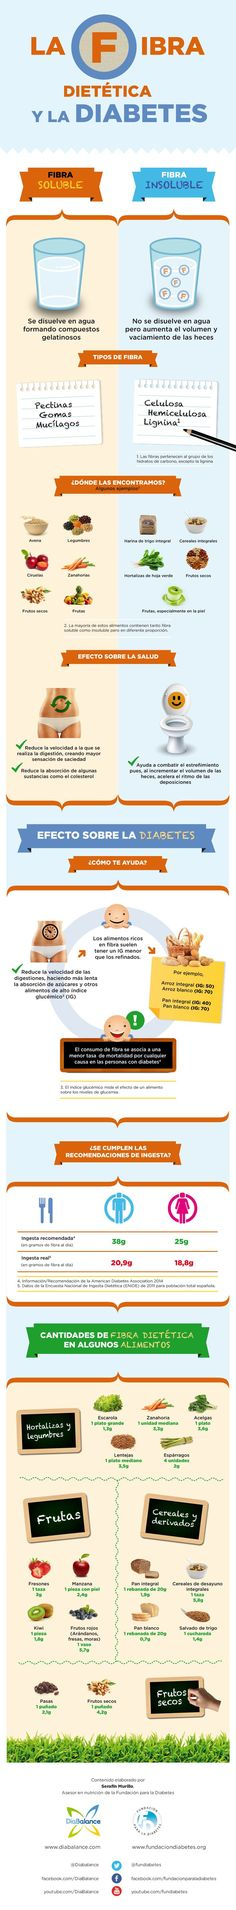 Ingerir fibra dietética para prevenir y aliviar la diabetes. #salud #diabetes #infografia